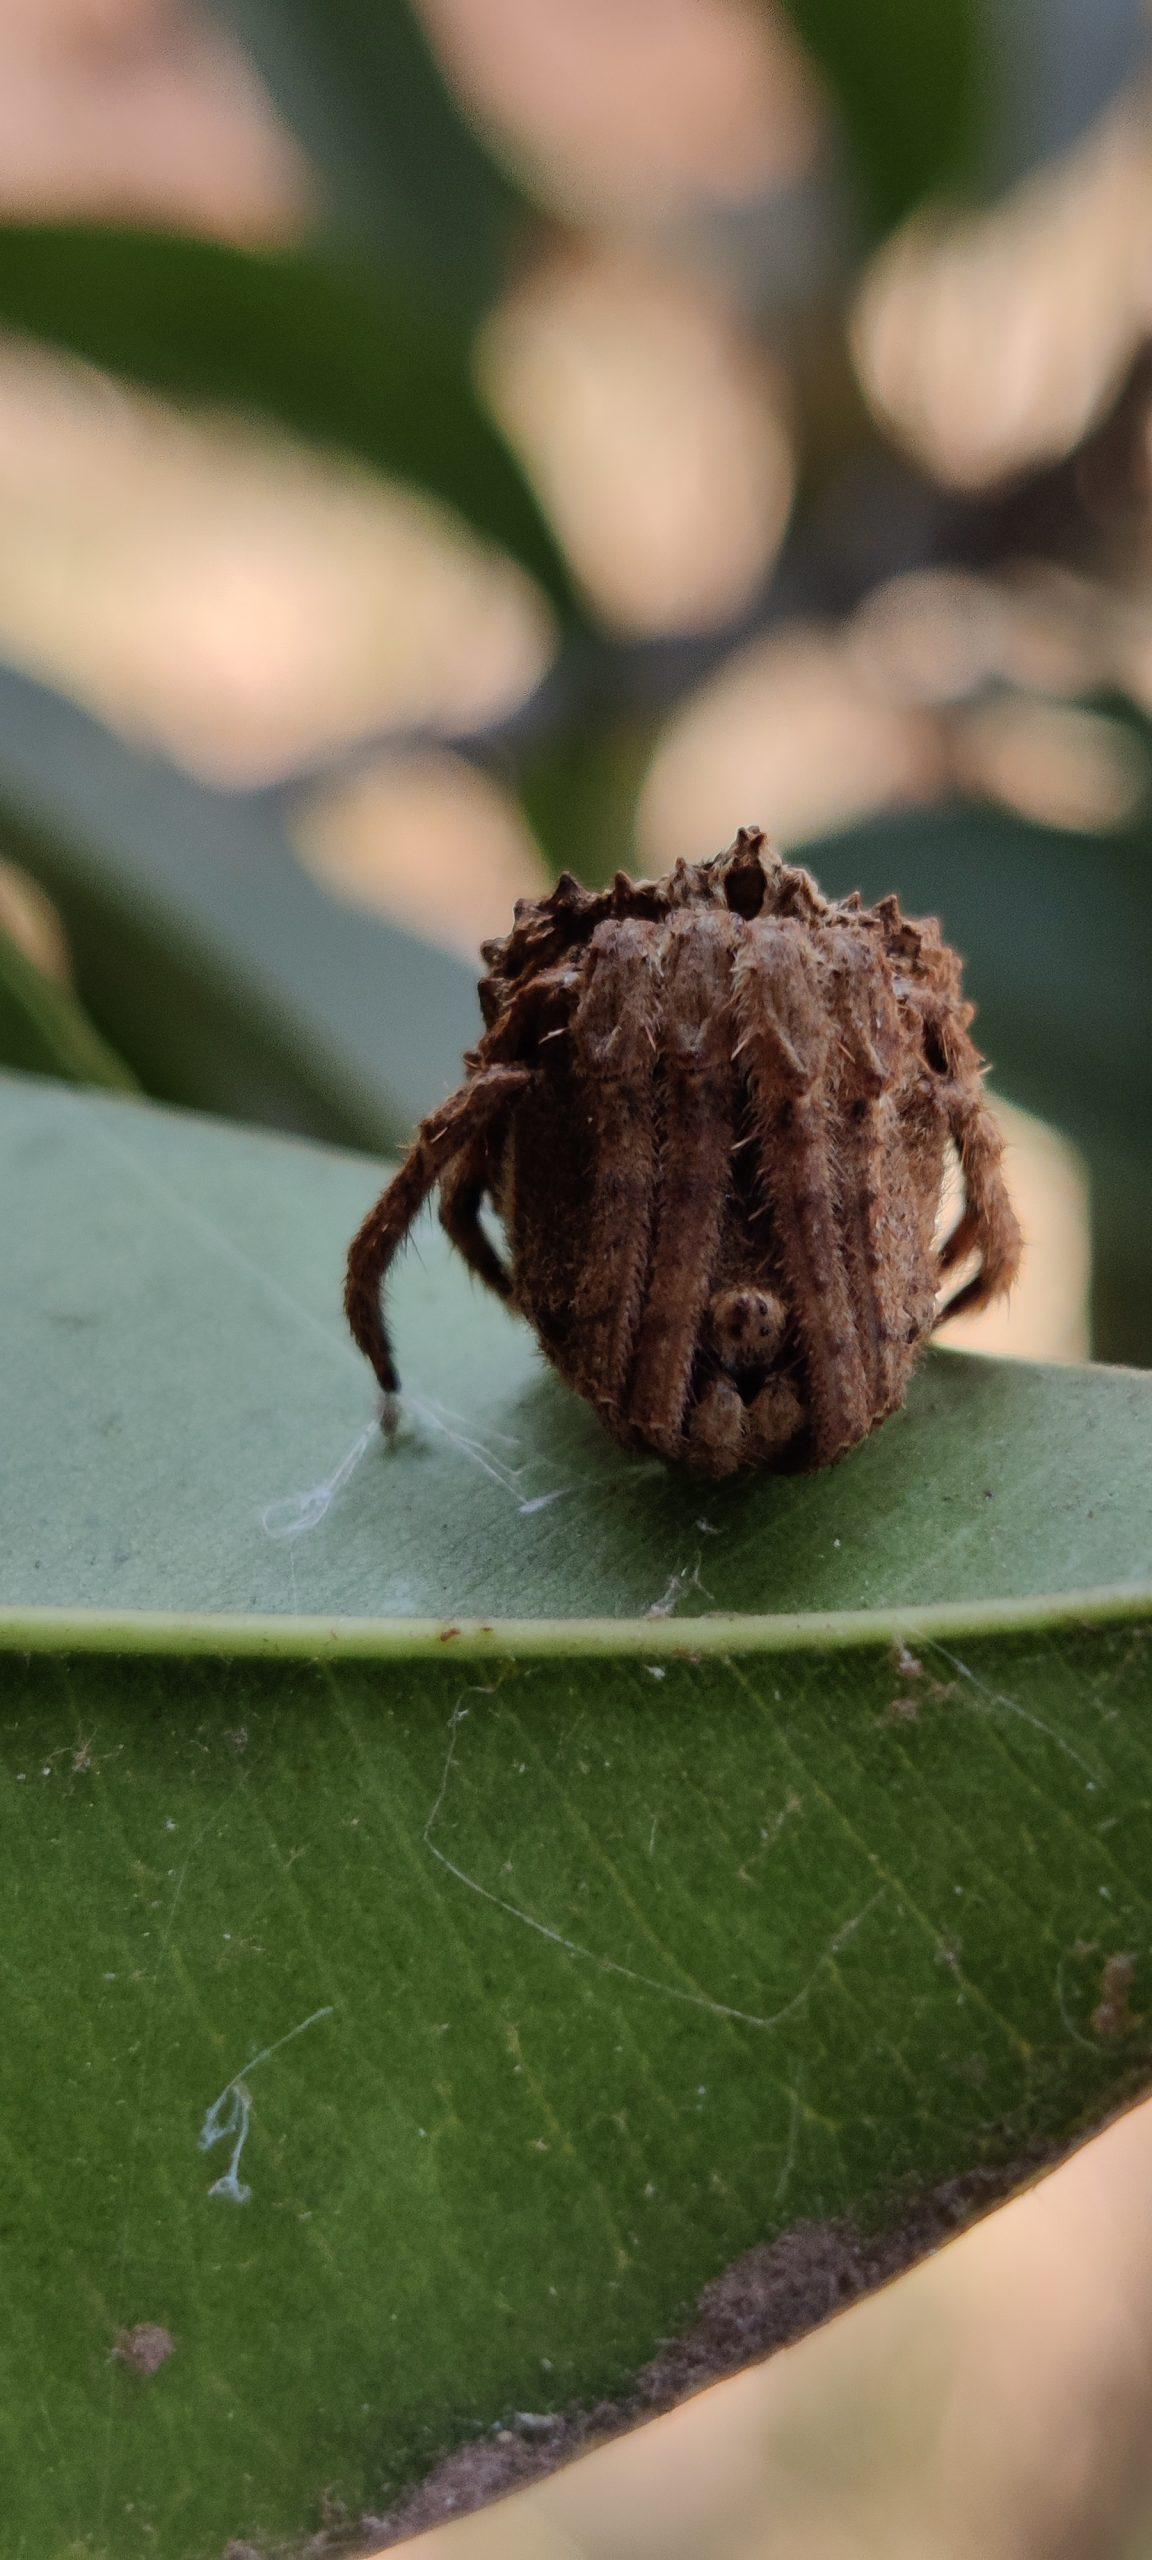 Acraea terpsicore spider